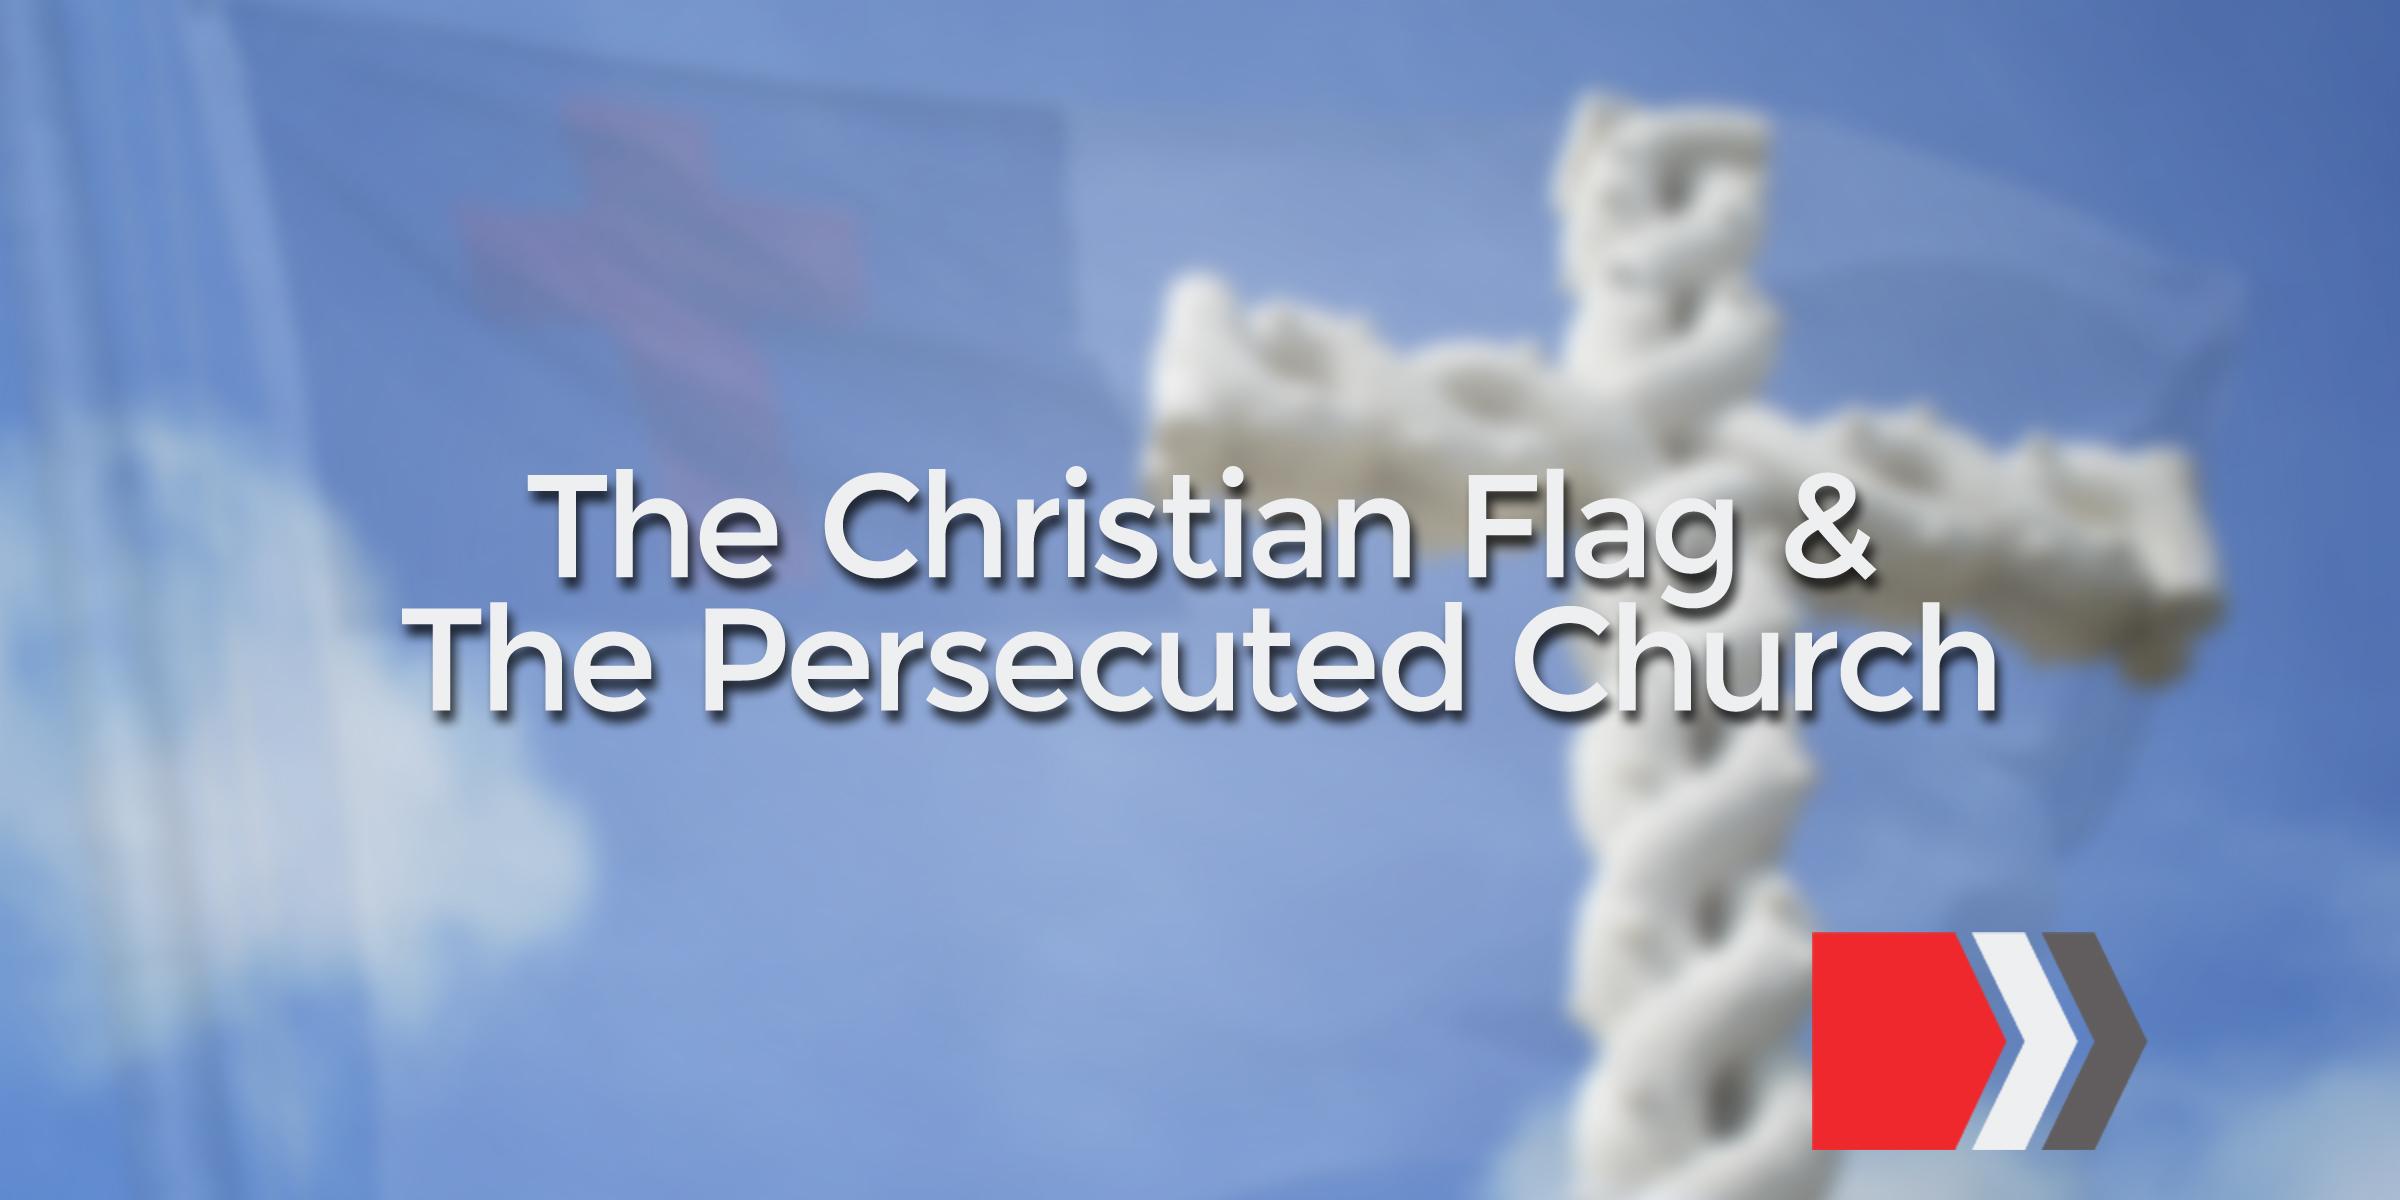 The Christian Flag & The Persecuted Church